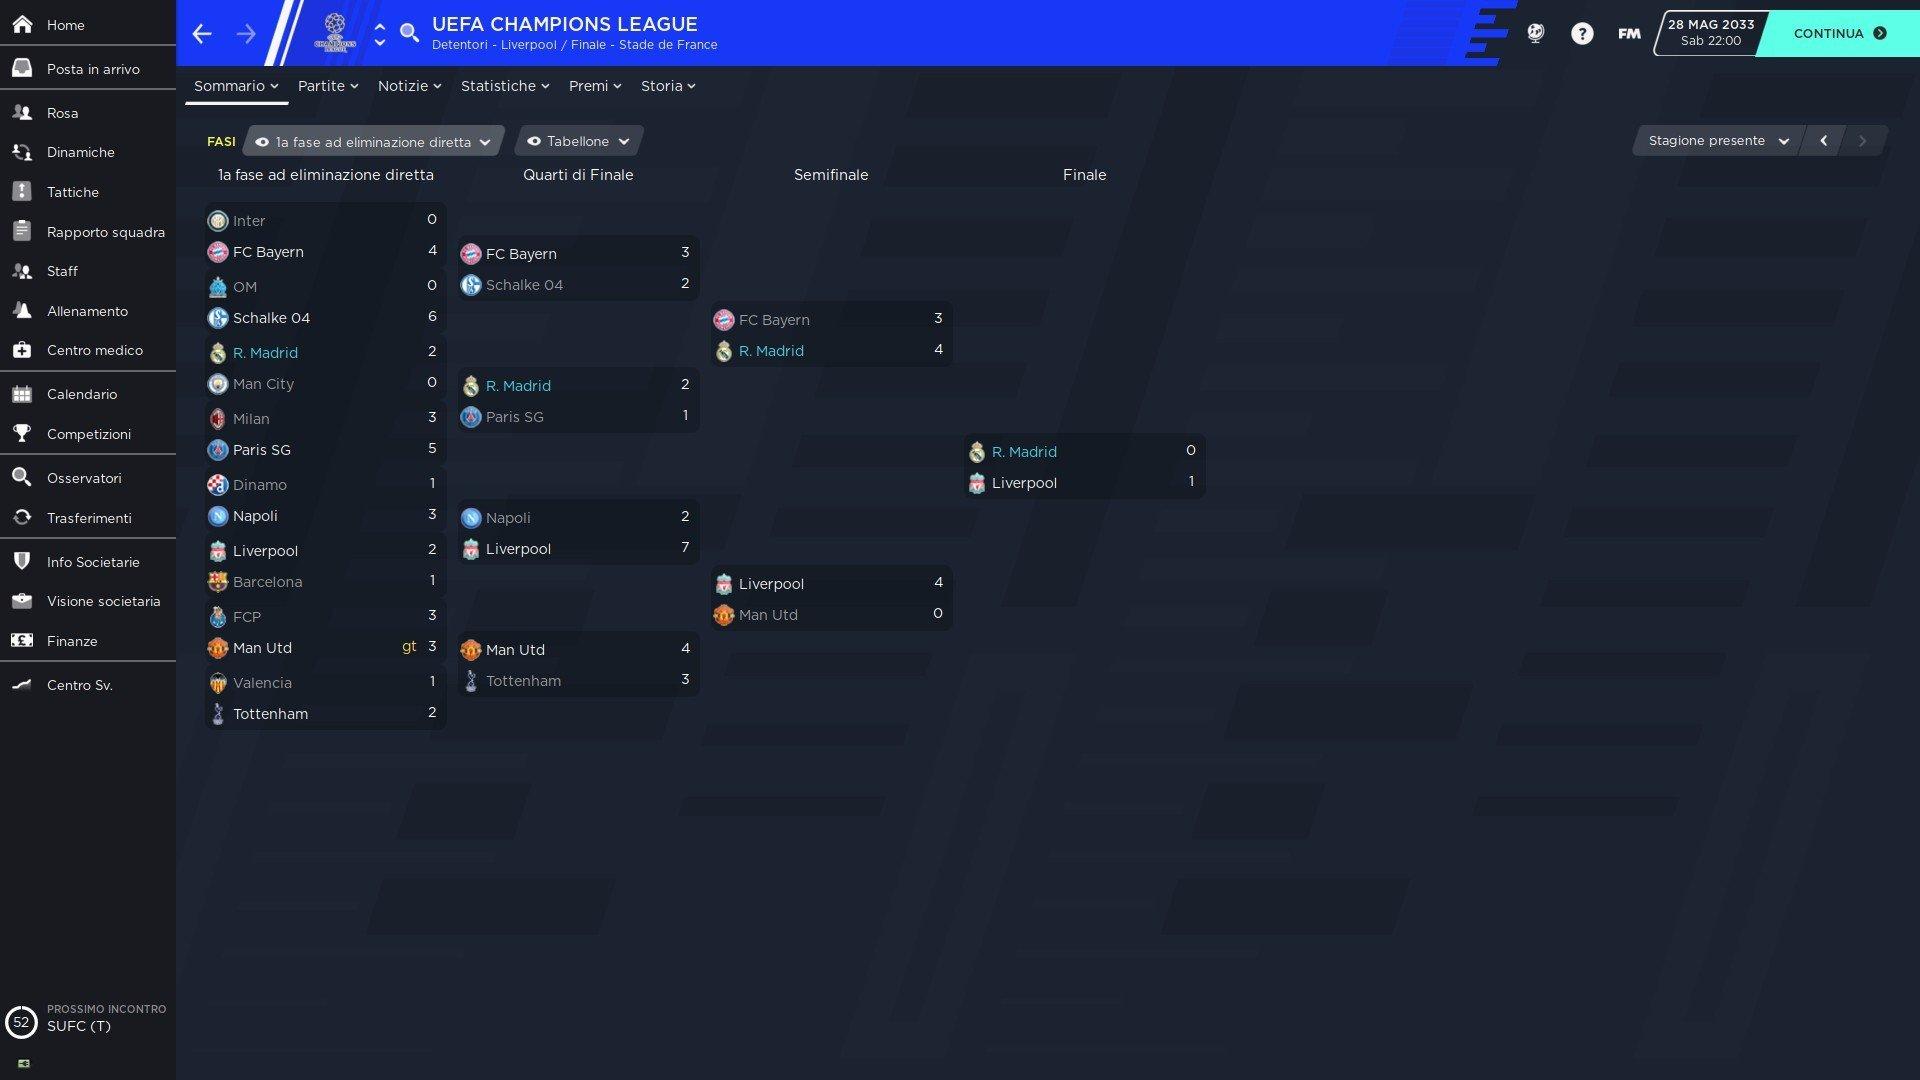 5 tabellone Champions